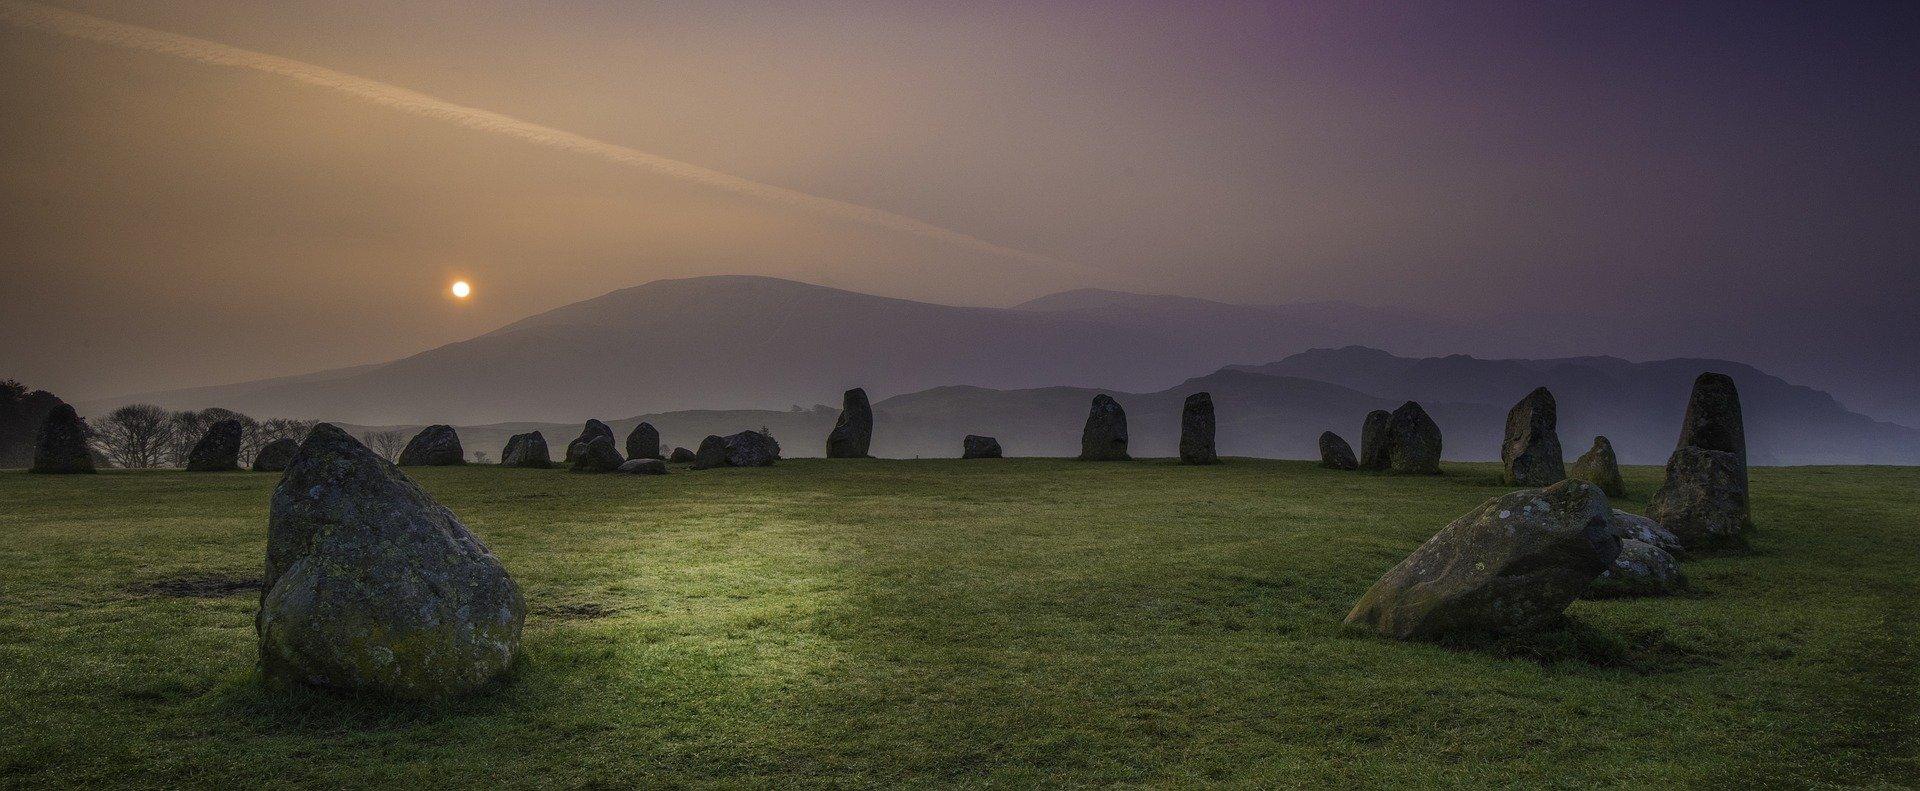 english countryside at dusk